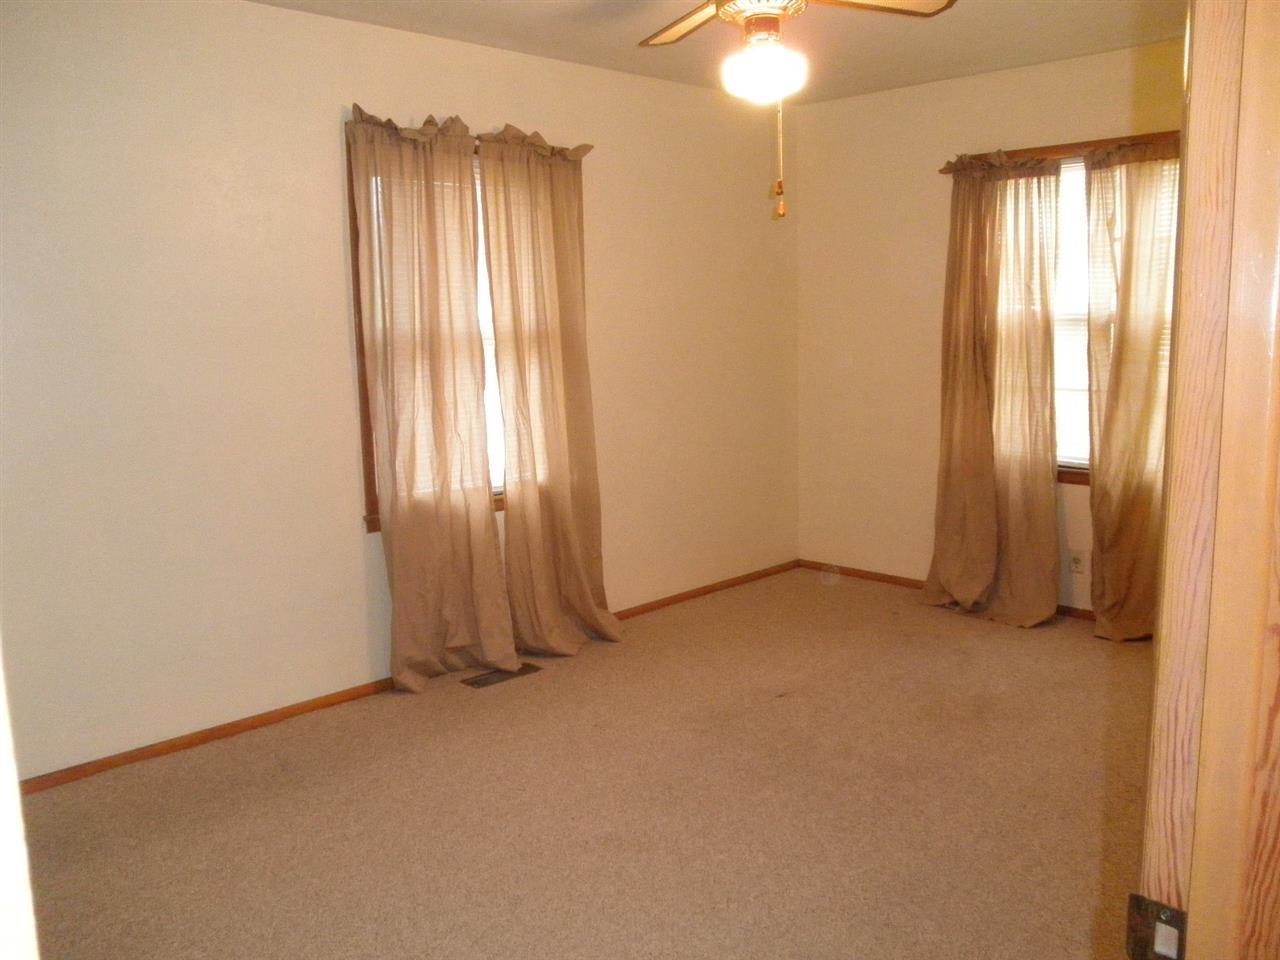 Sold Cross Sale W/ MLS | 508 Glendale  Ponca City, OK 74601 12